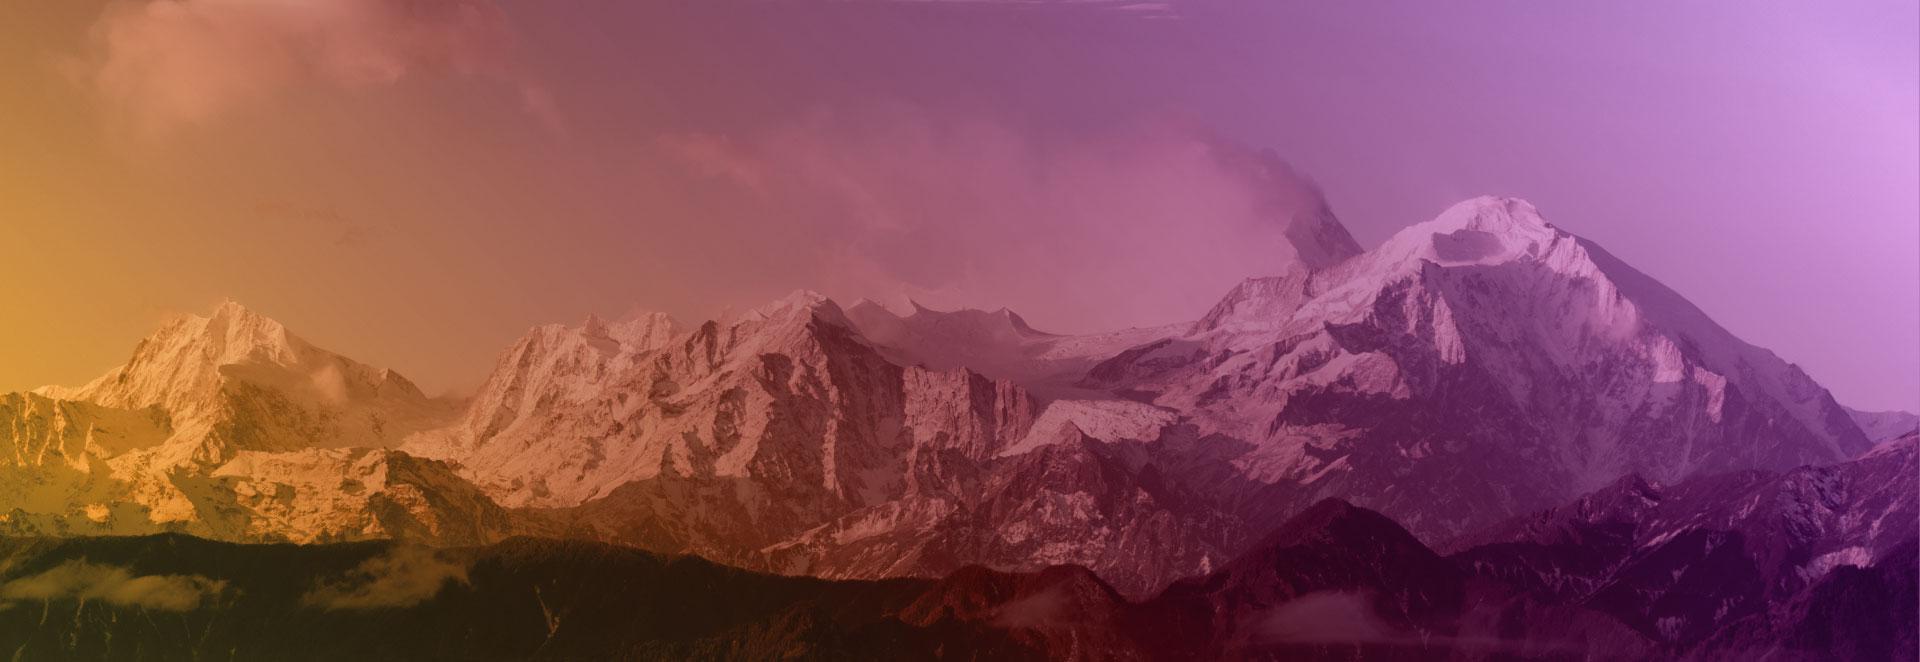 Imagen de un paisaje montañoso